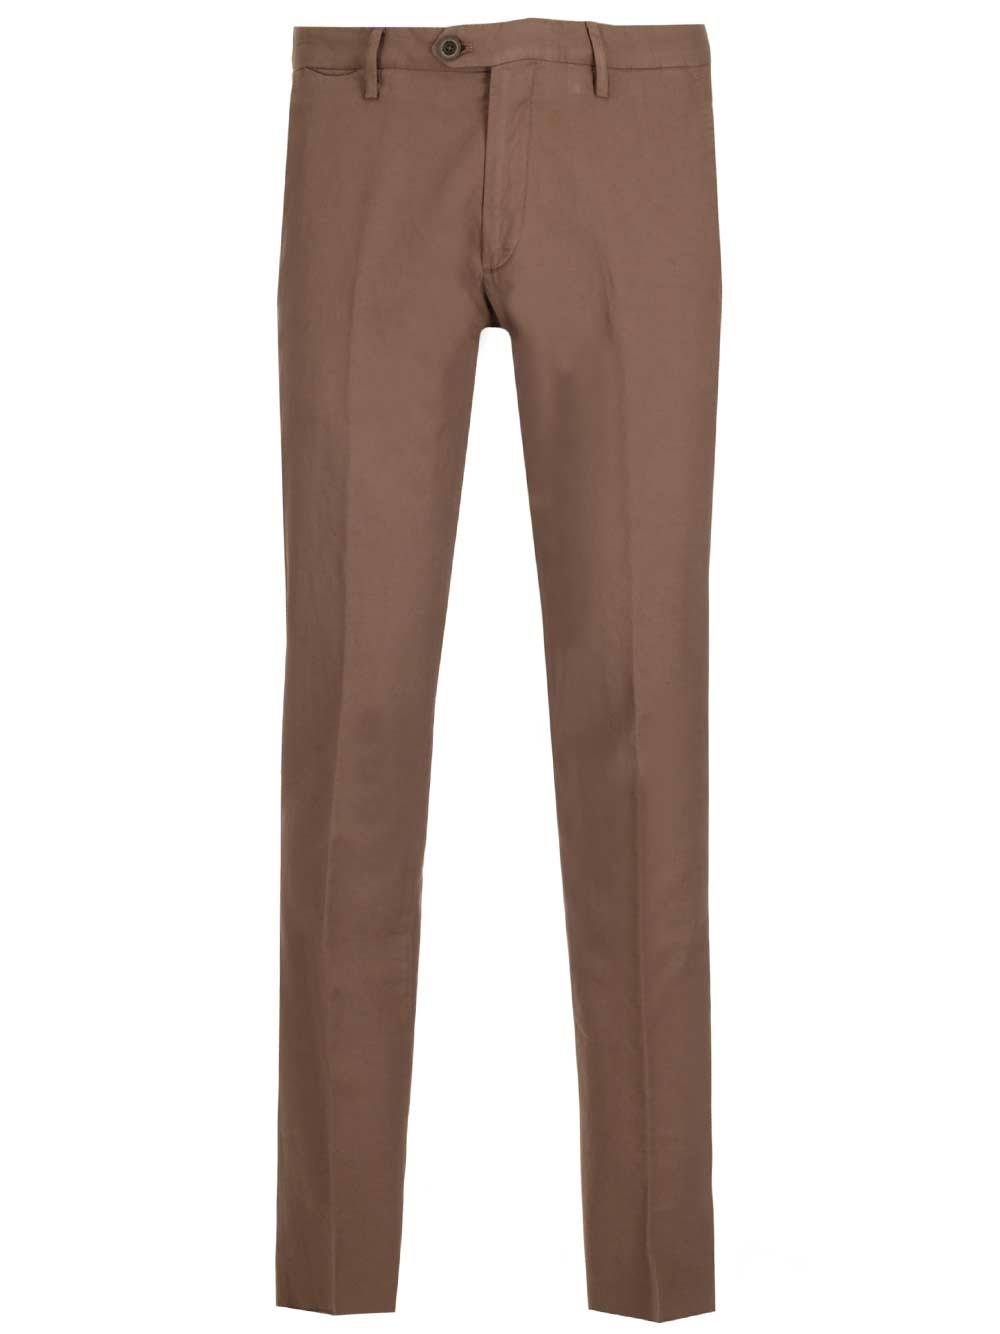 AL DUCA D'AOSTA 1902 Cotton And Linen Canvas Trousers